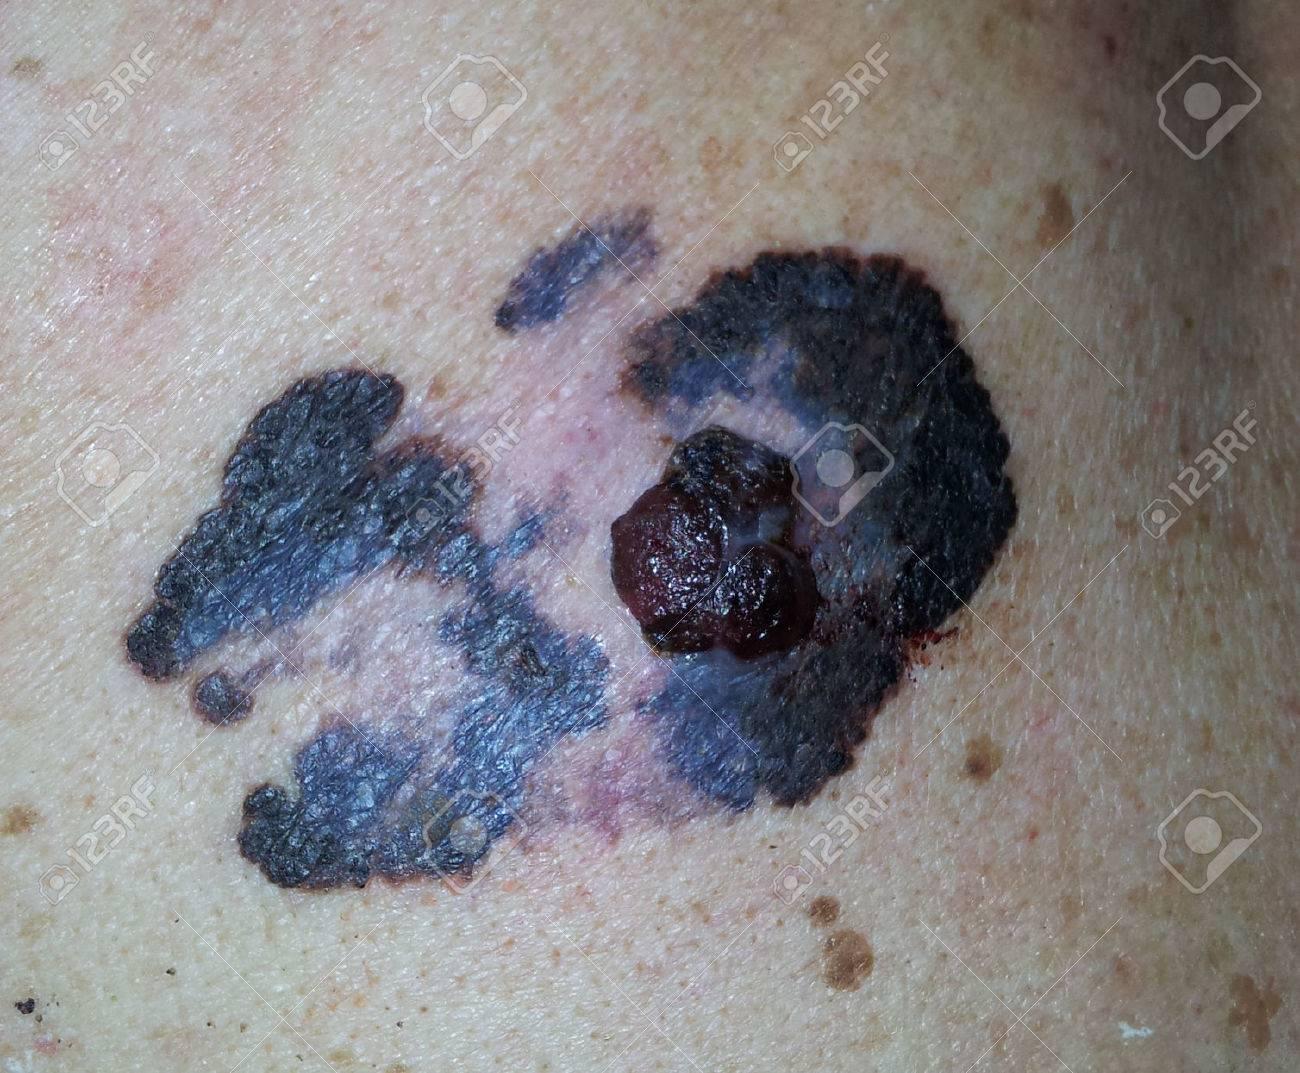 http://n3.datasn.io/data/api/v1/n3zm/image_of_skin_disease_5/by_table/skin_disease_image_download_access/71/cc/67/ca/71cc67caf08c9ca505c584a8f9a8f4e2004dbf49.jpg